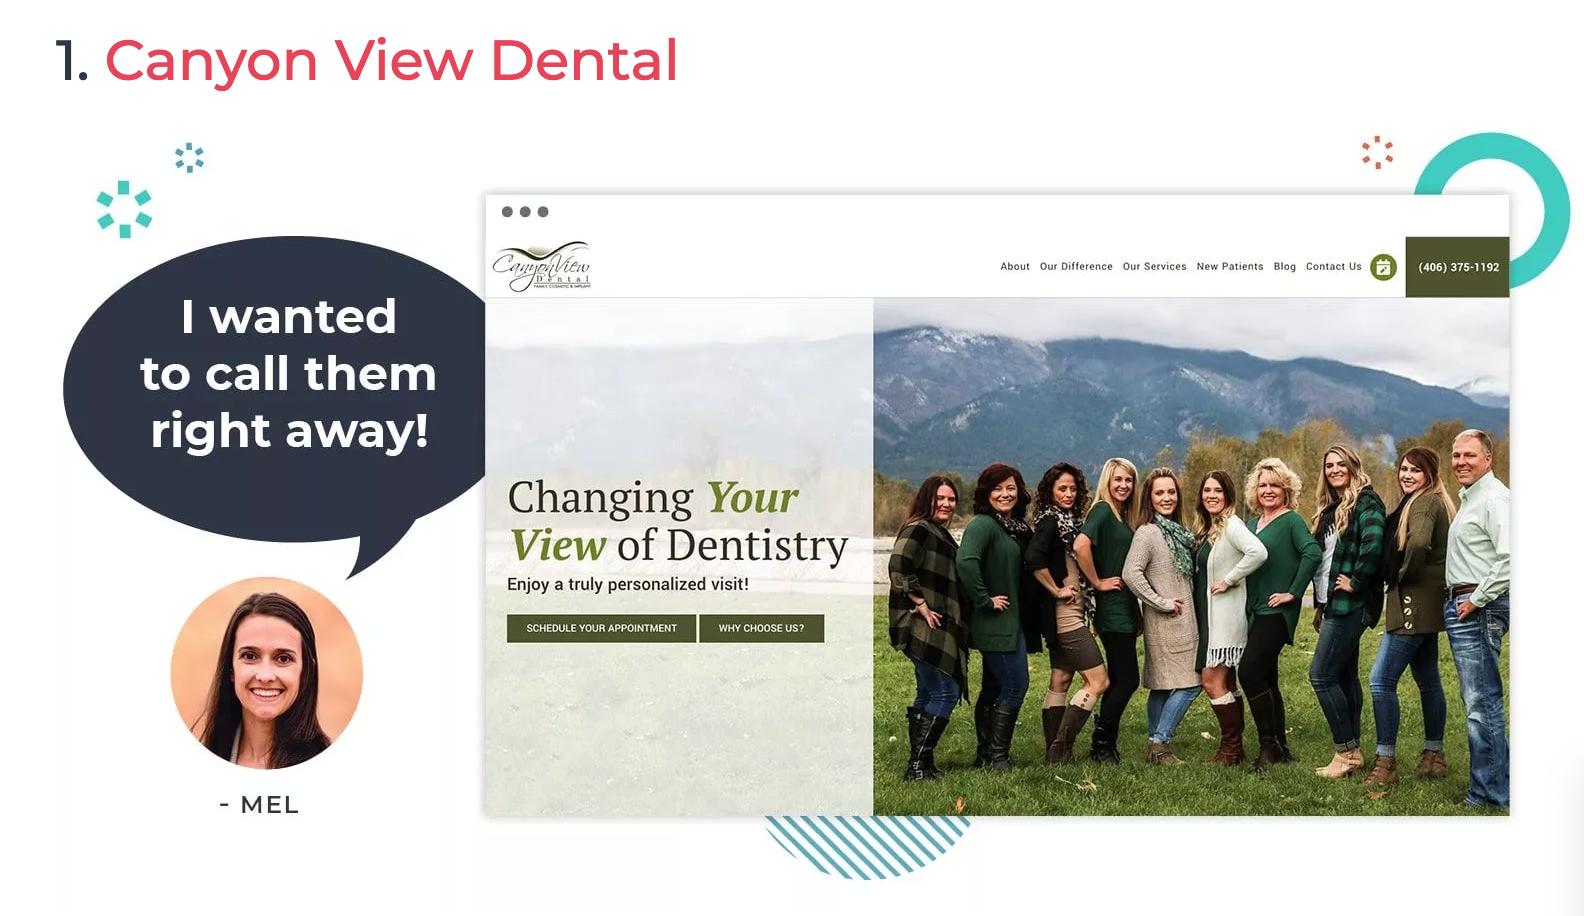 Canon View Dental